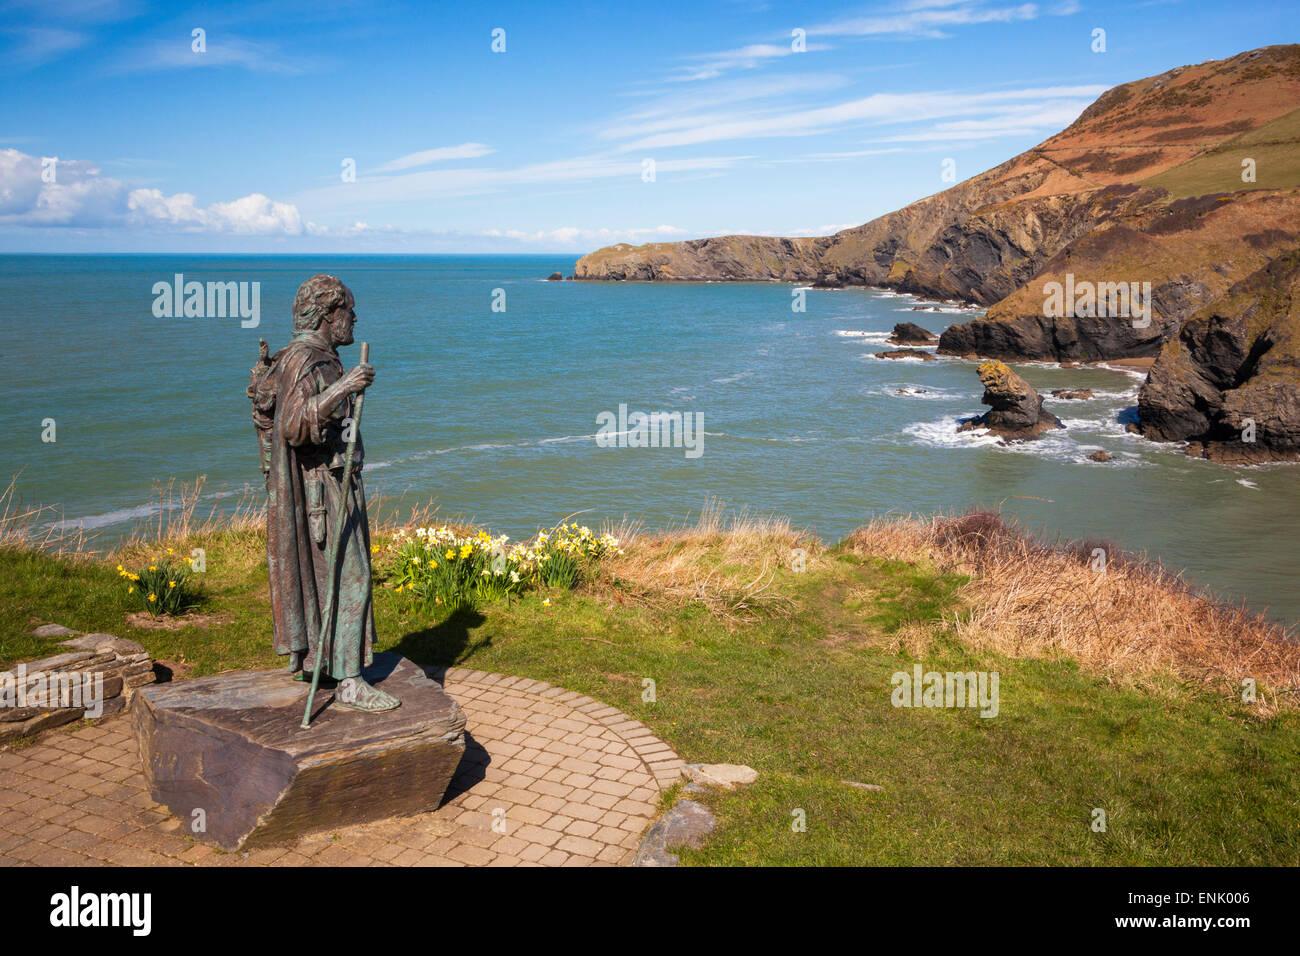 Statue of St. Carannog, Llangrannog Beach, Ceredigion (Cardigan), West Wales, Wales, United Kingdom, Europe - Stock Image